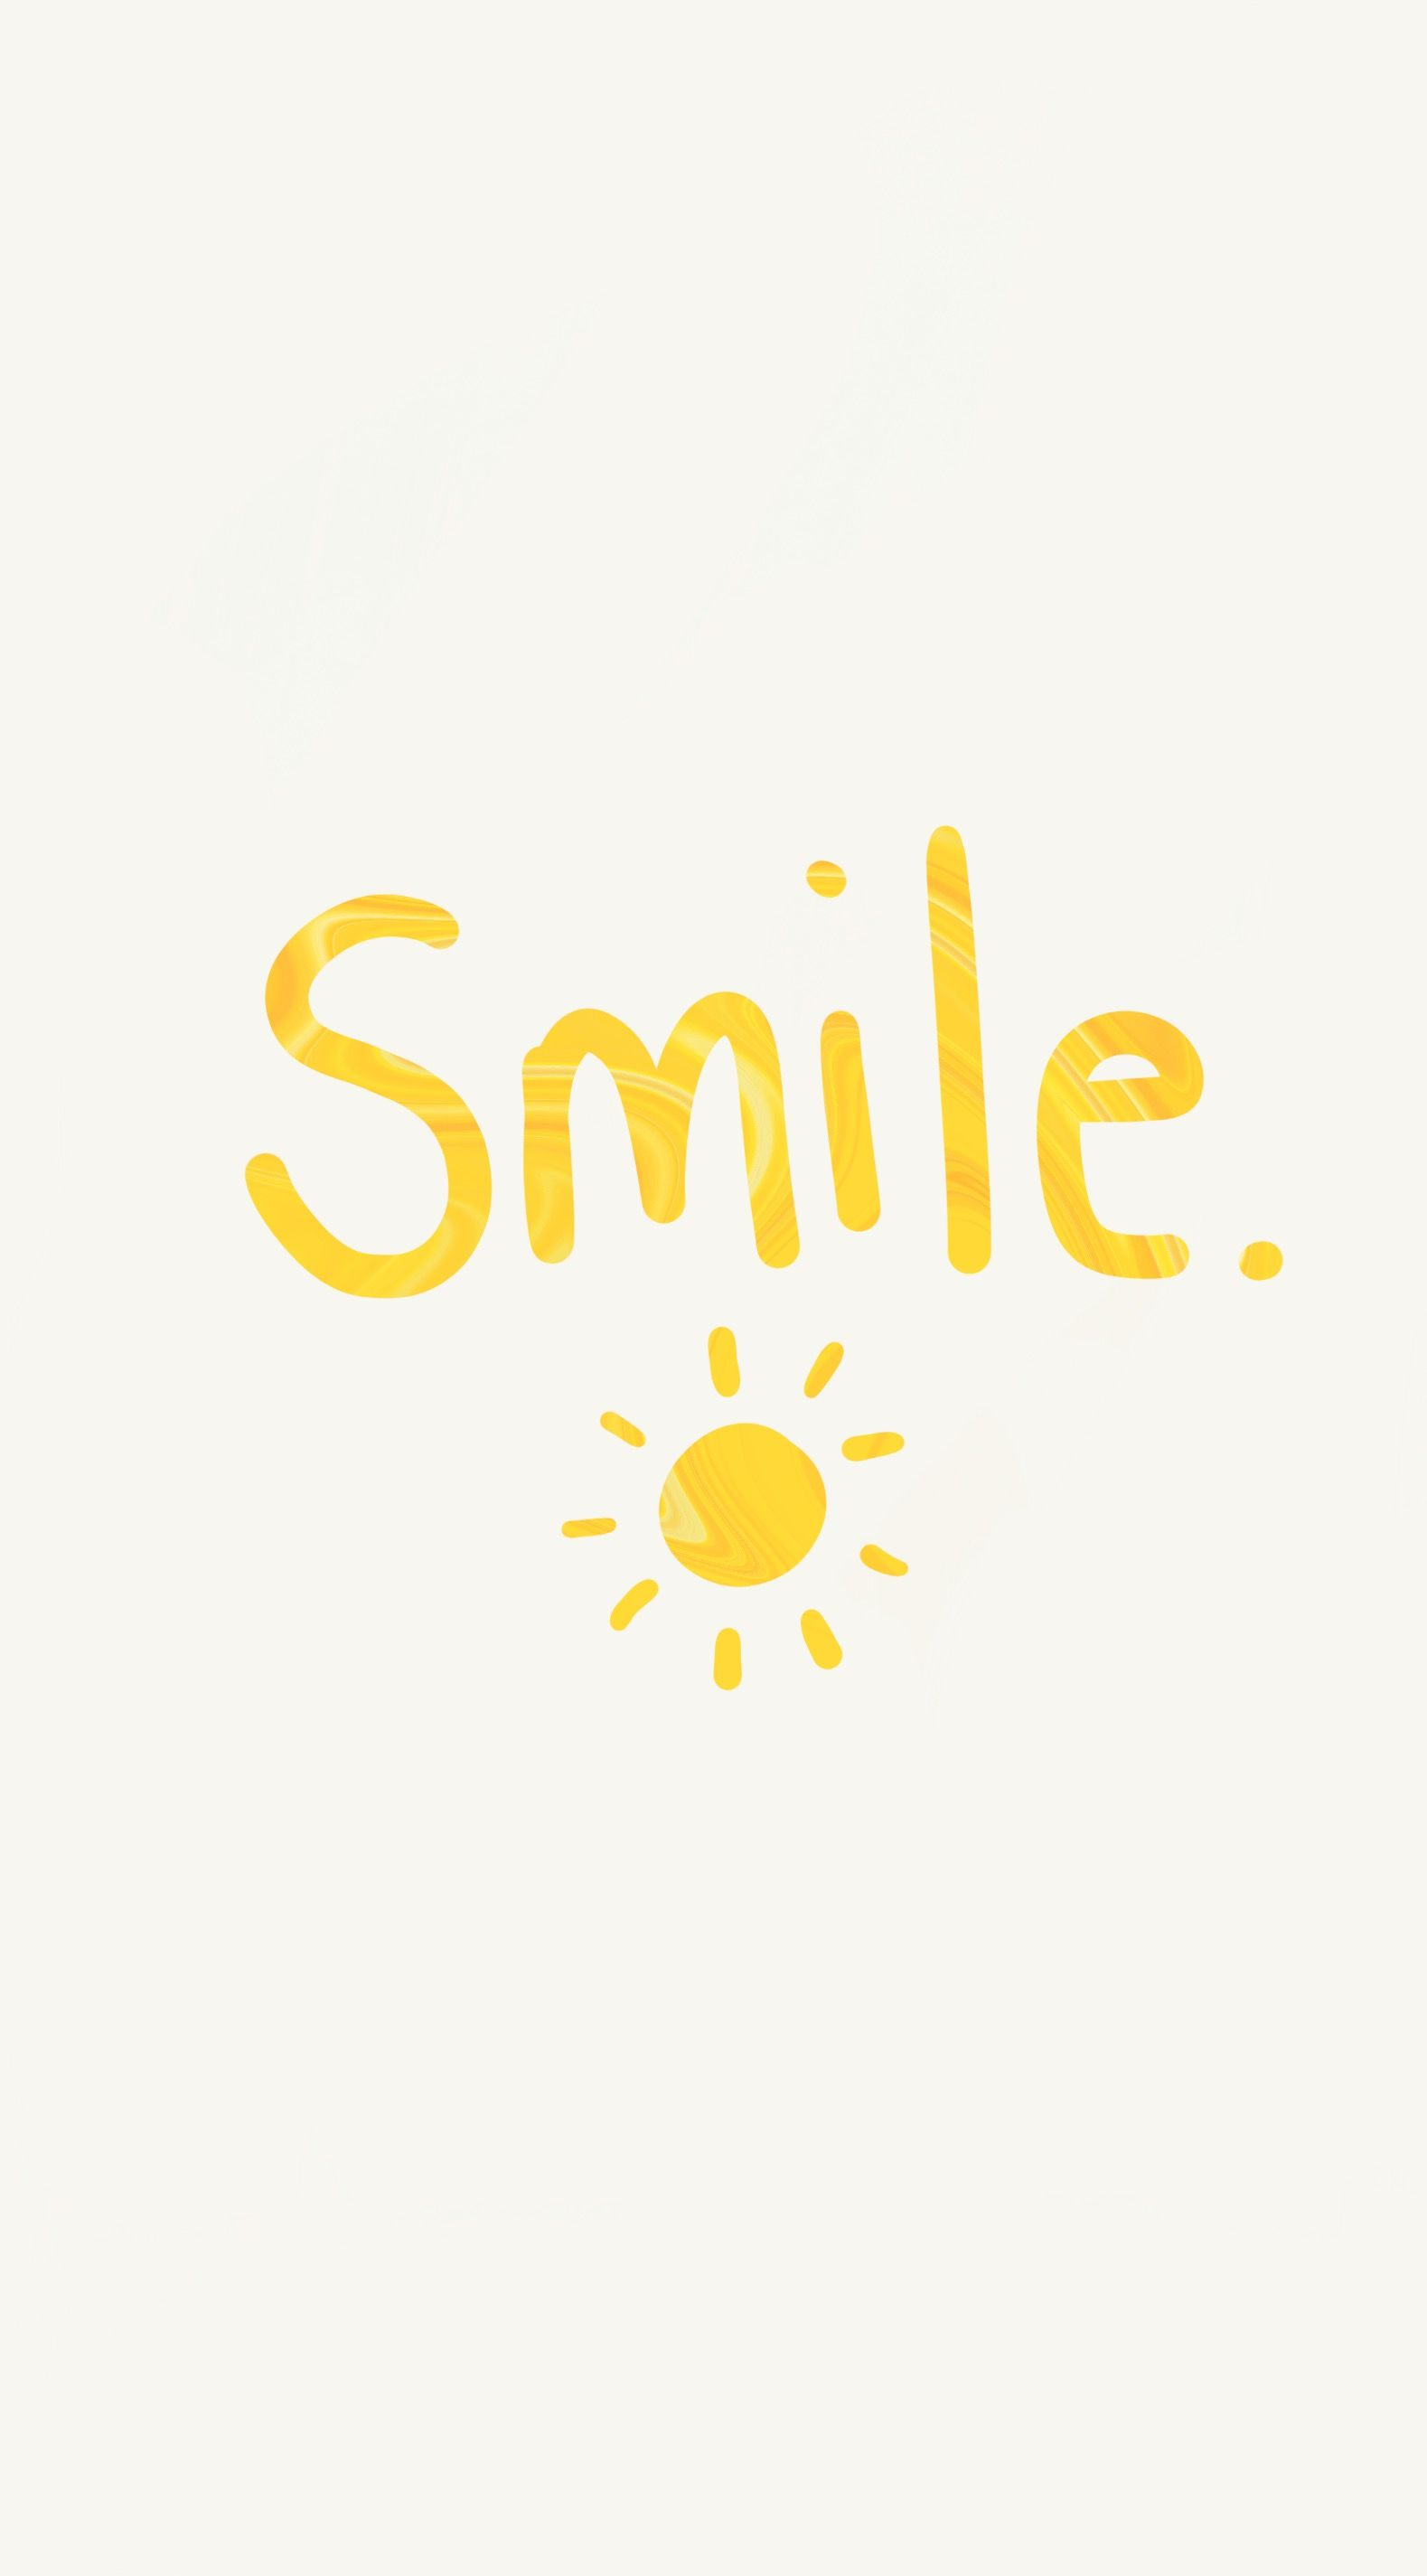 Inverted Smile Wallpaper Happy Wallpaper Smile Wallpaper Cute Wallpaper For Phone